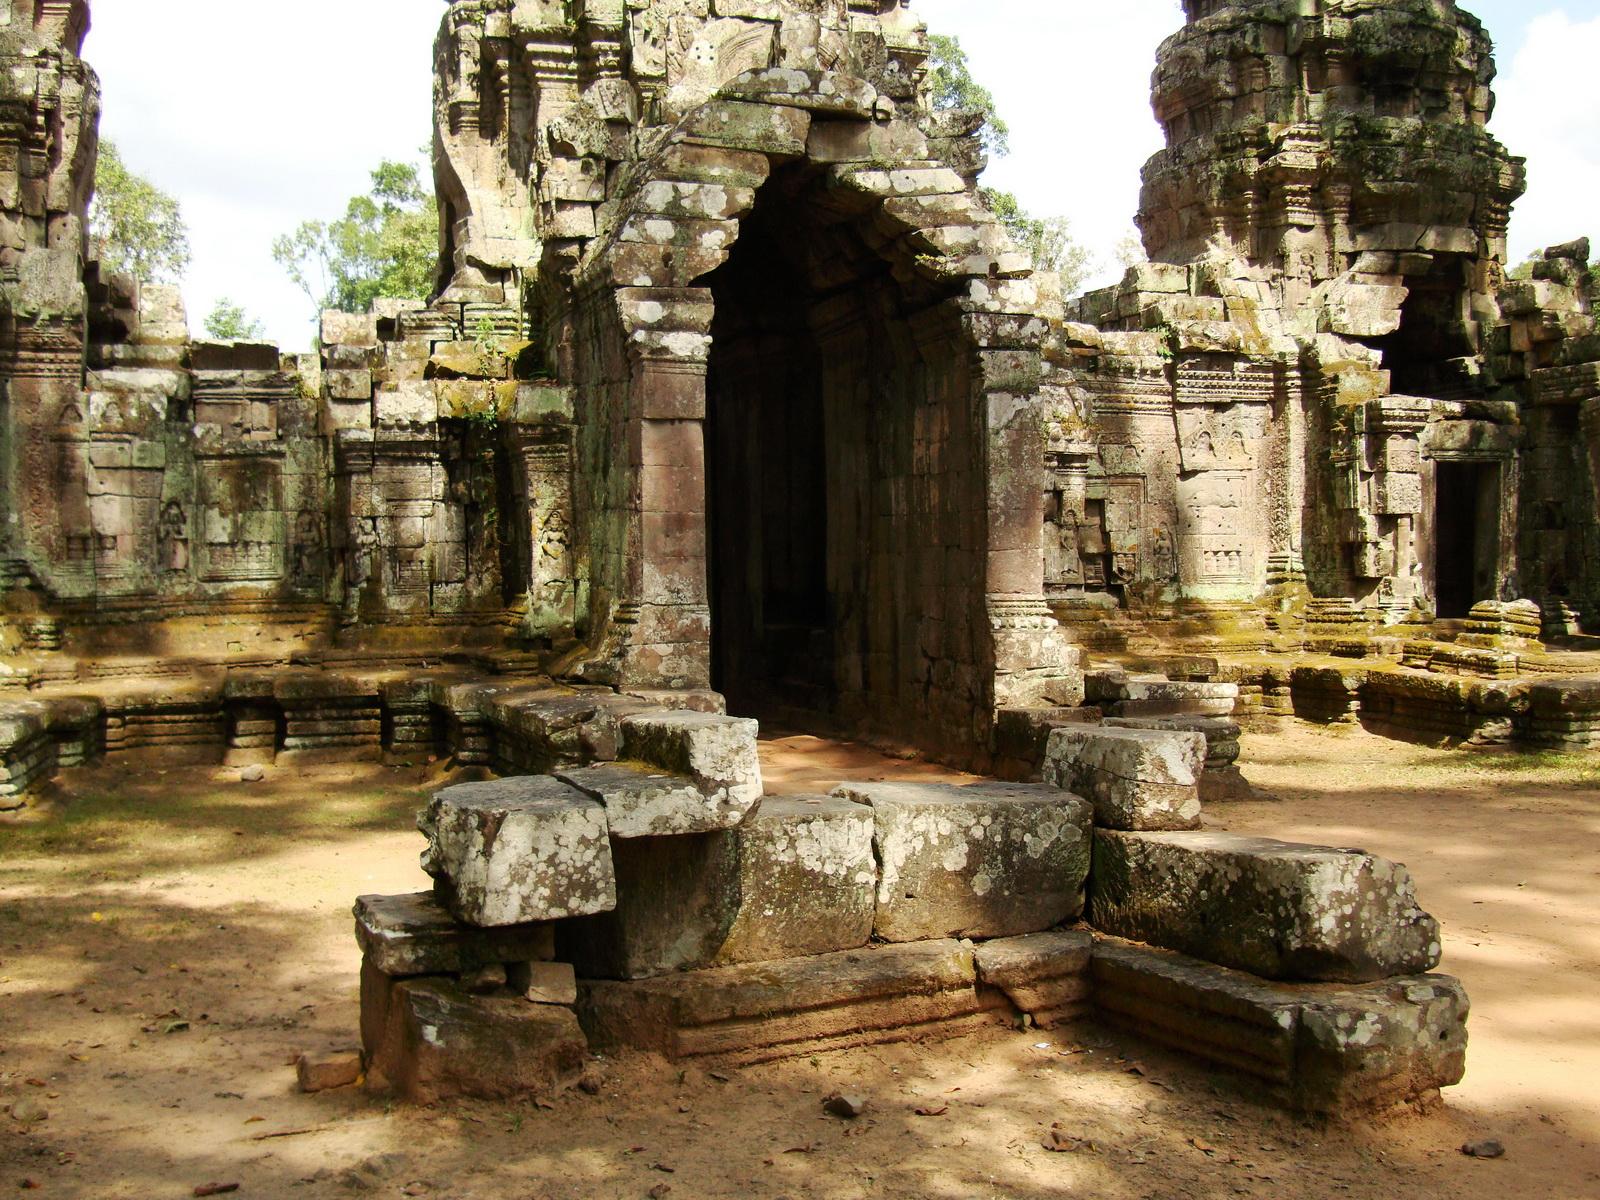 Preah Khan Temple west Gopuram entry tower naga bridge Angkor Thom 16